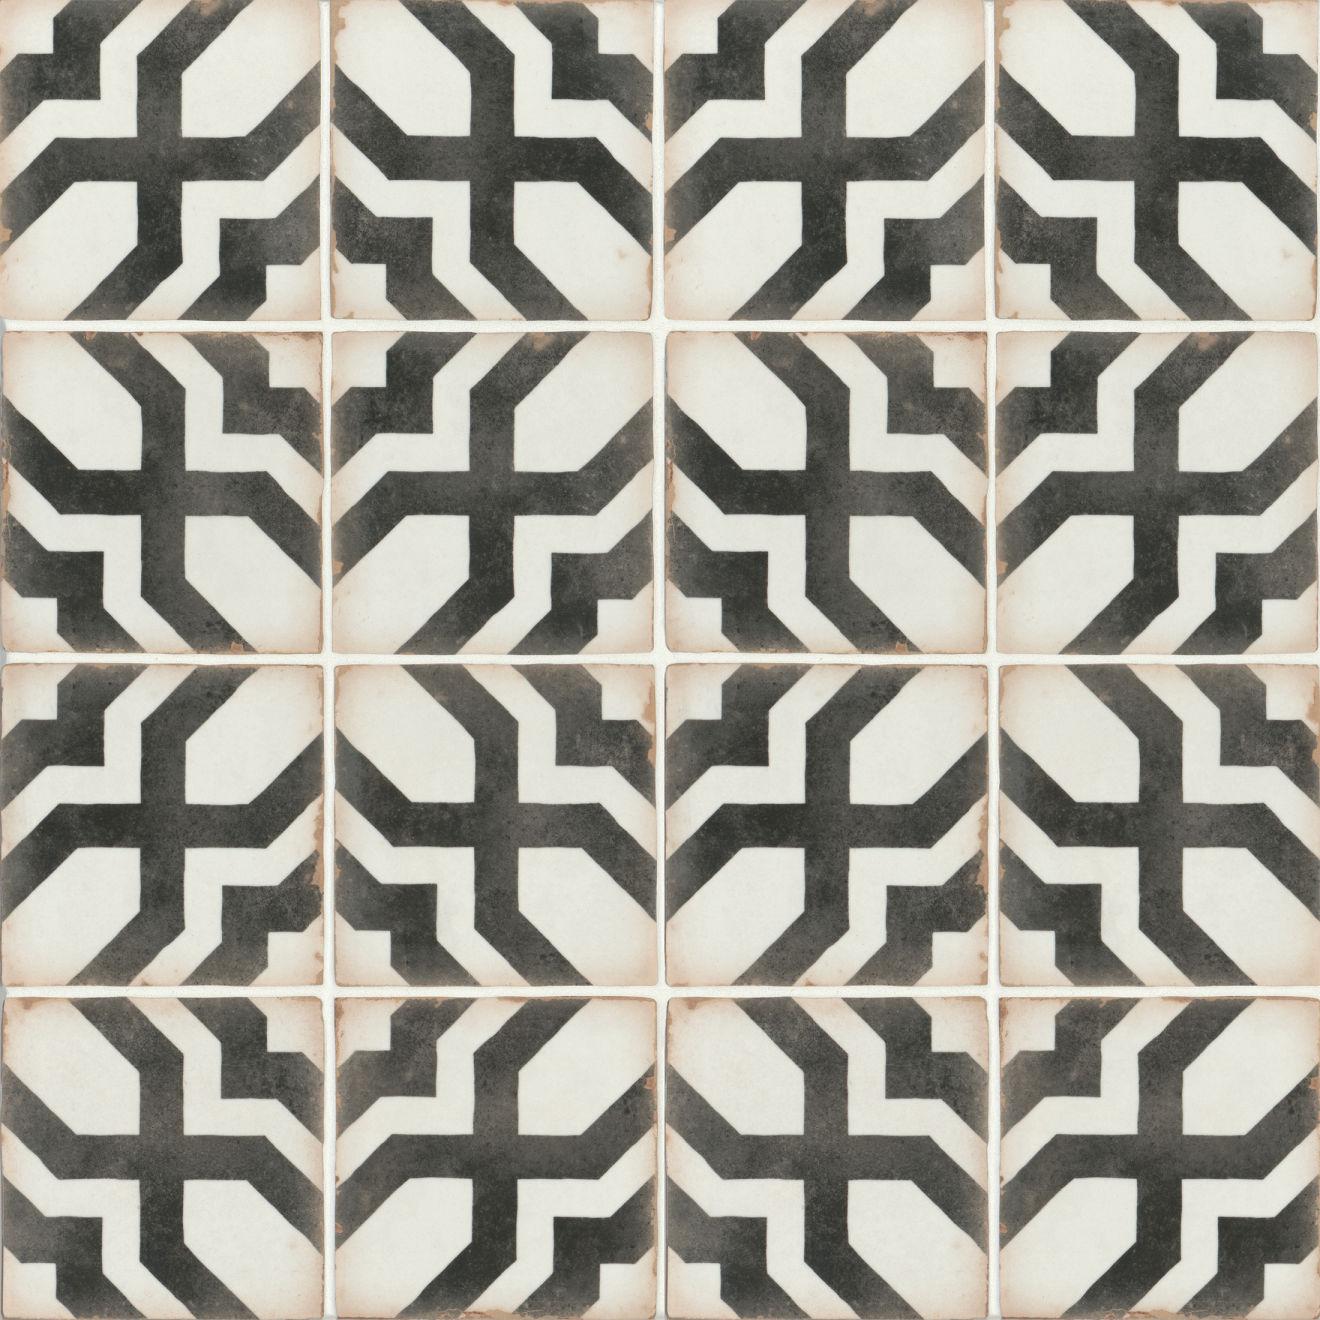 "Casablanca 5"" x 5"" Matte Ceramic Floor and Wall Tile in Farissi"